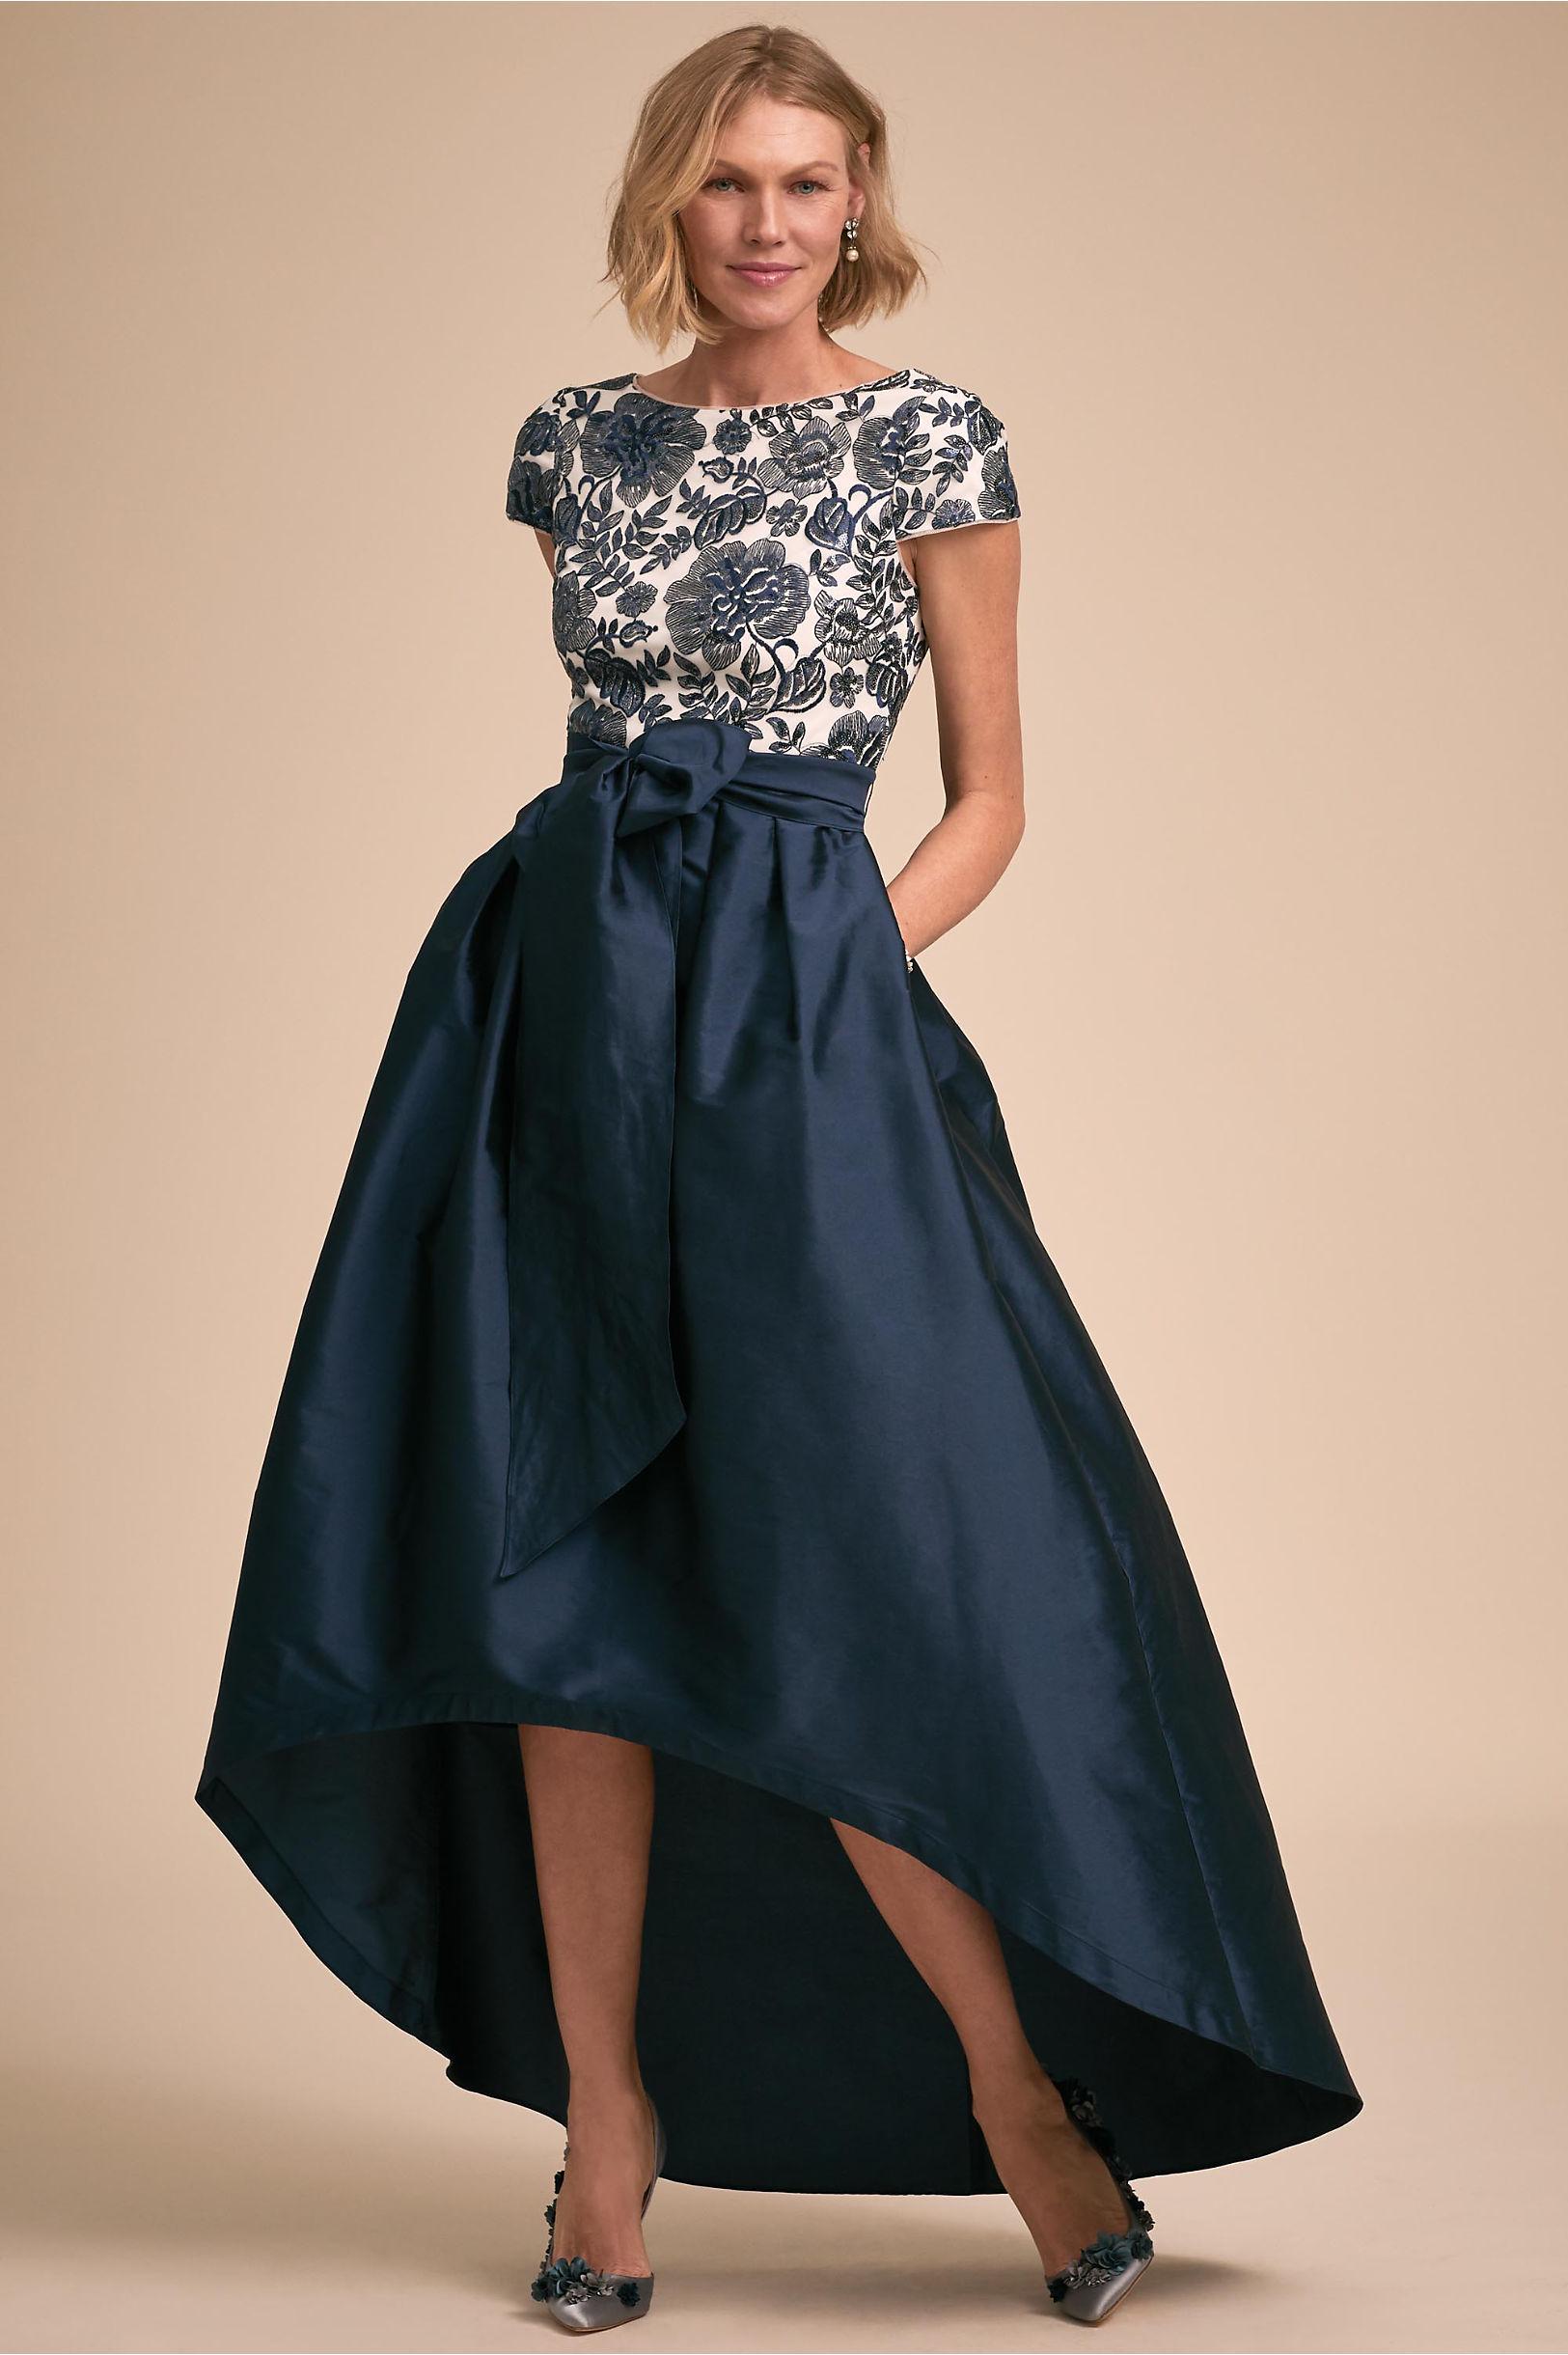 Mariana Dress in Sale | BHLDN